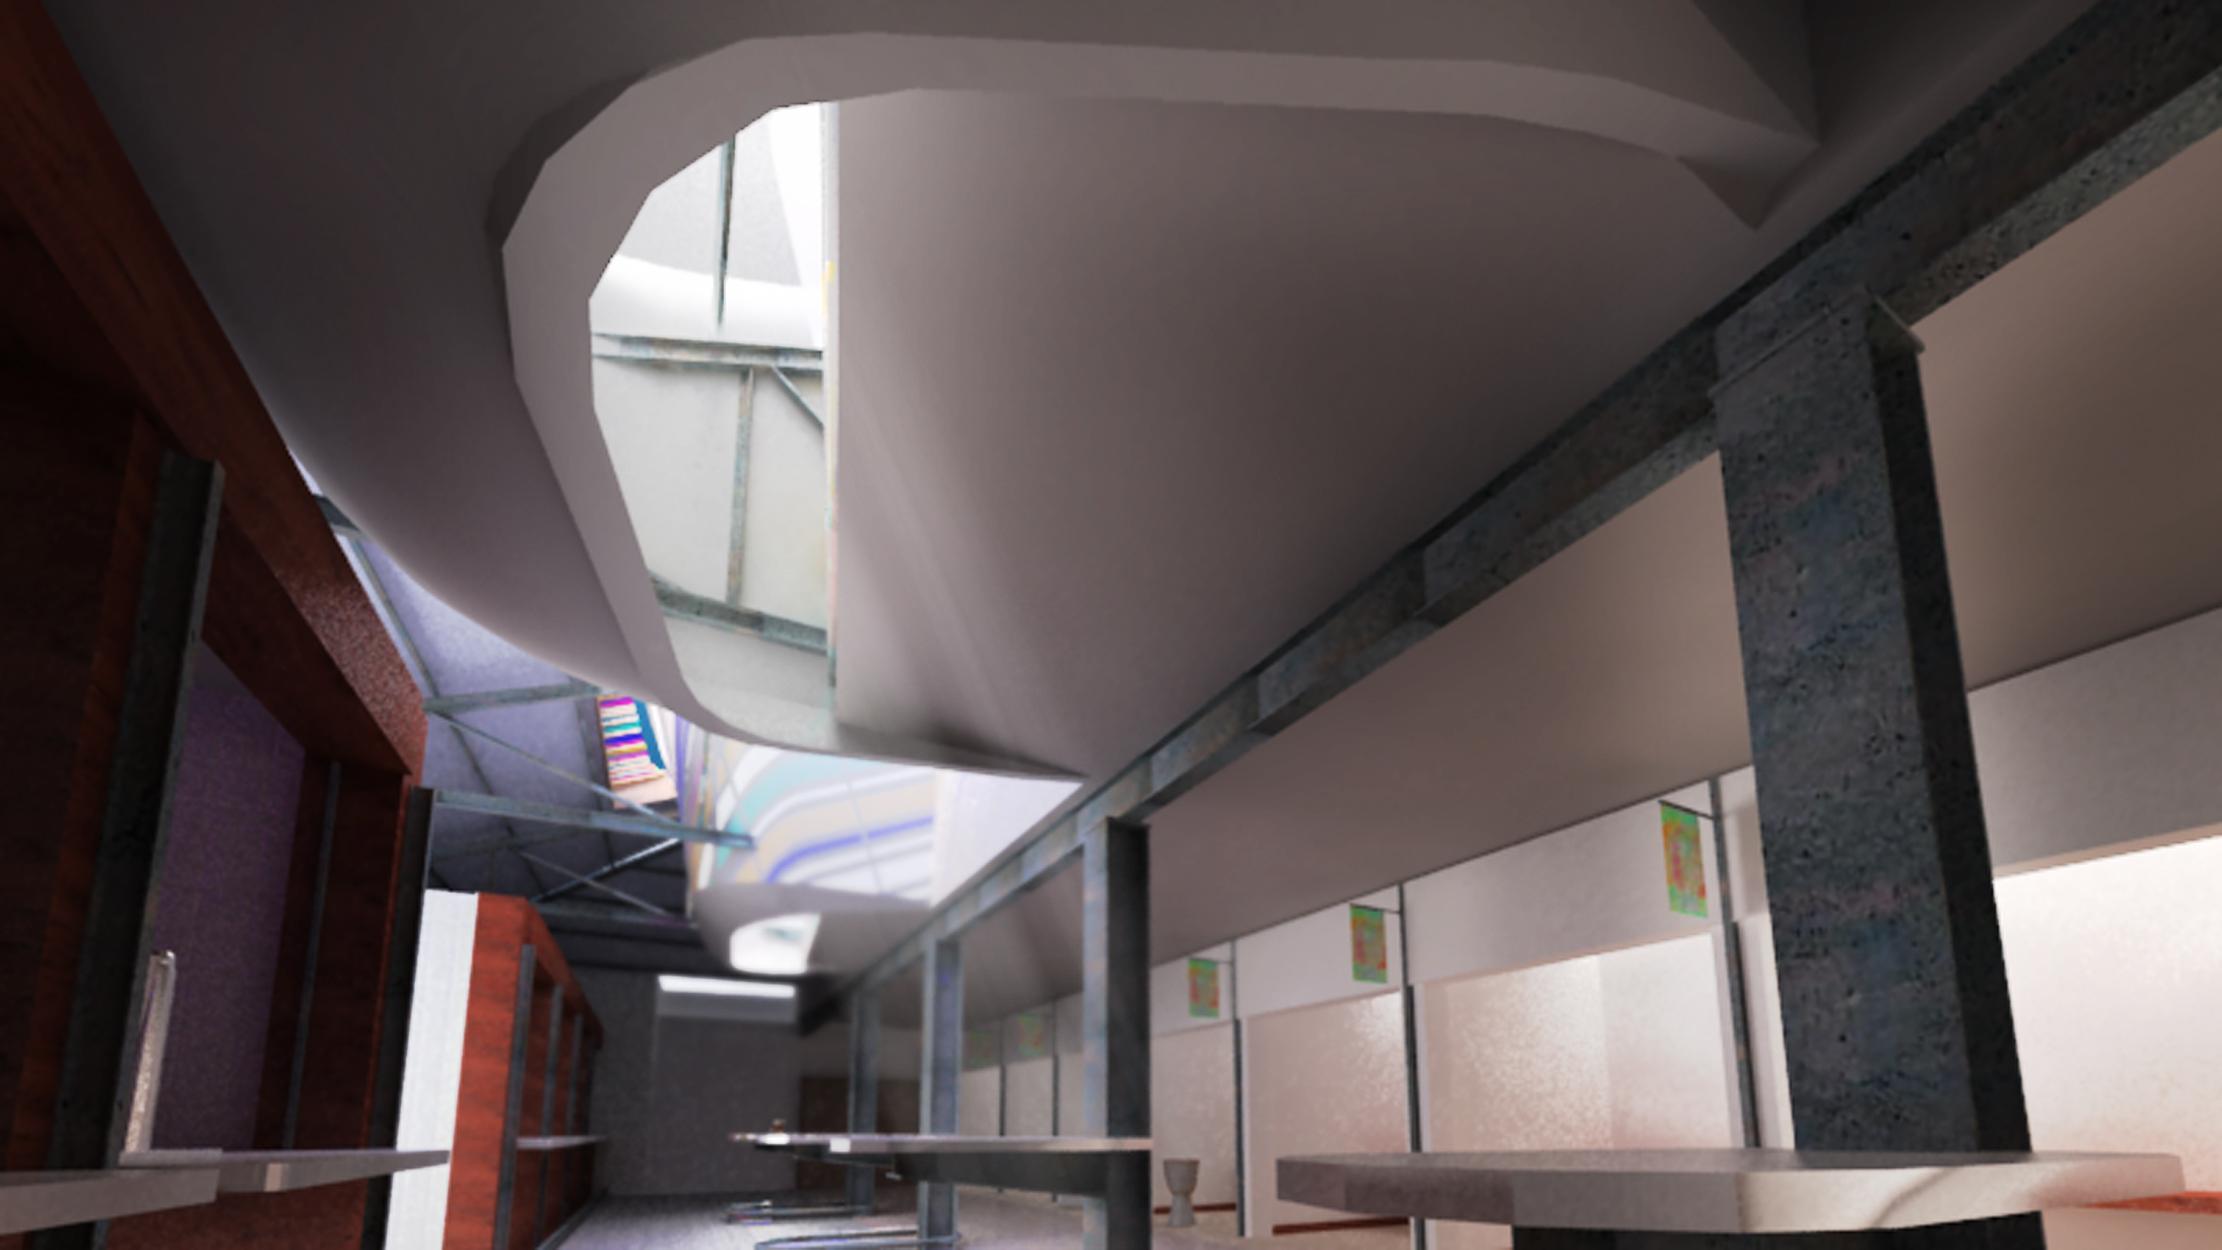 Xaloc arquitectos estudio de arquitectura en getafe for Estudios de arquitectura en madrid